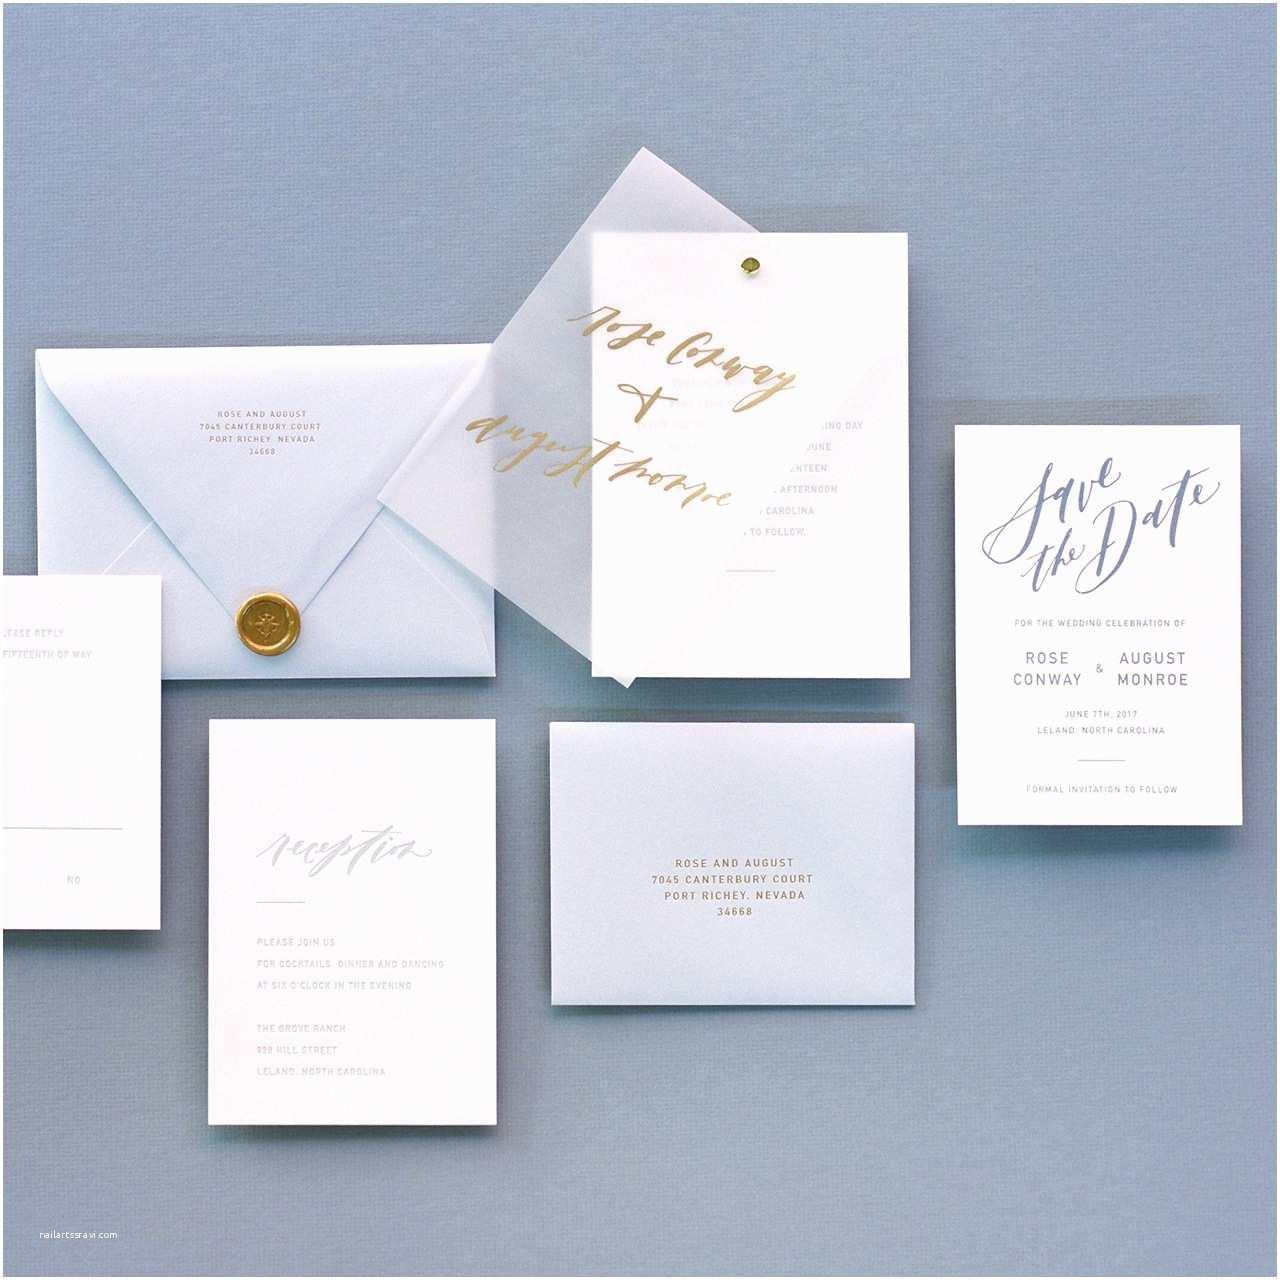 Wedding Invitations with Clear Overlay Trendspotting Vellum Inspiration